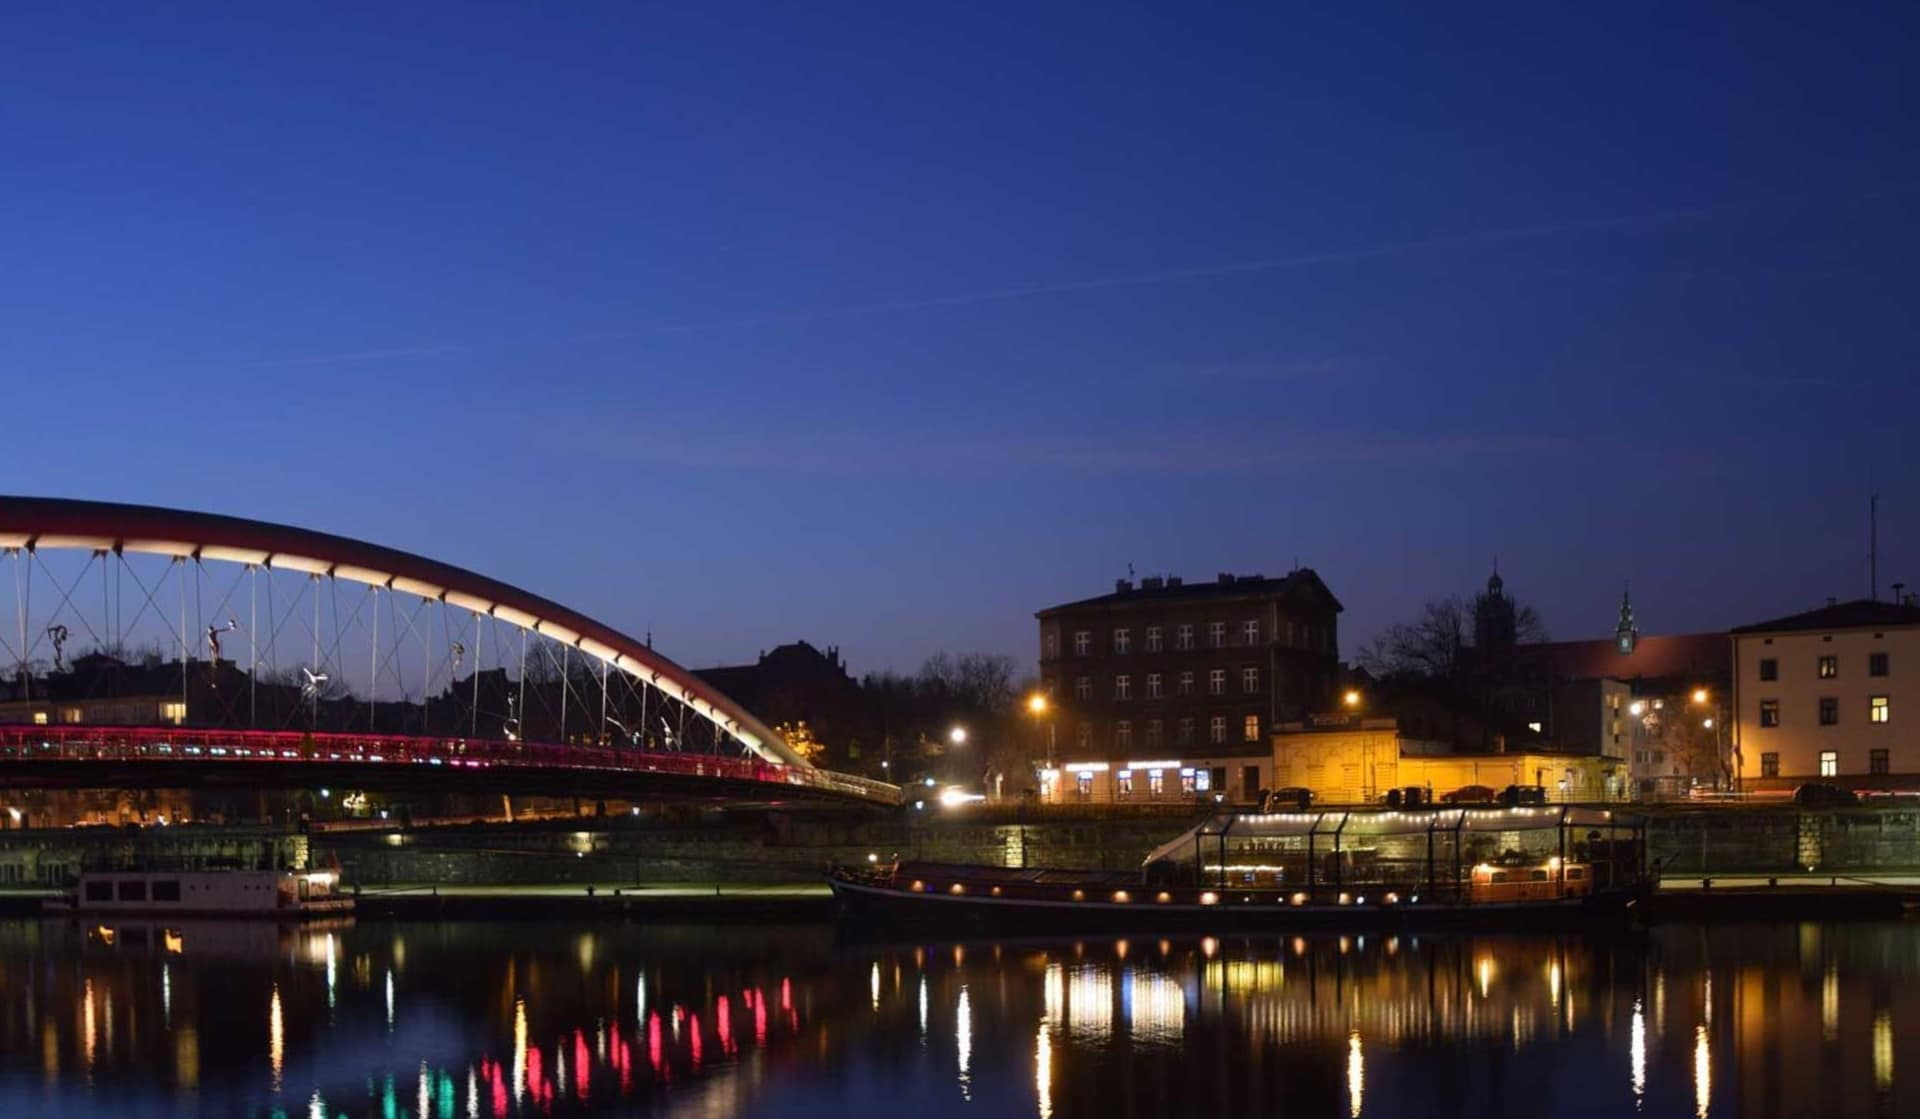 Un ponte sulla Vistola tra Kazimierz e Podgorze